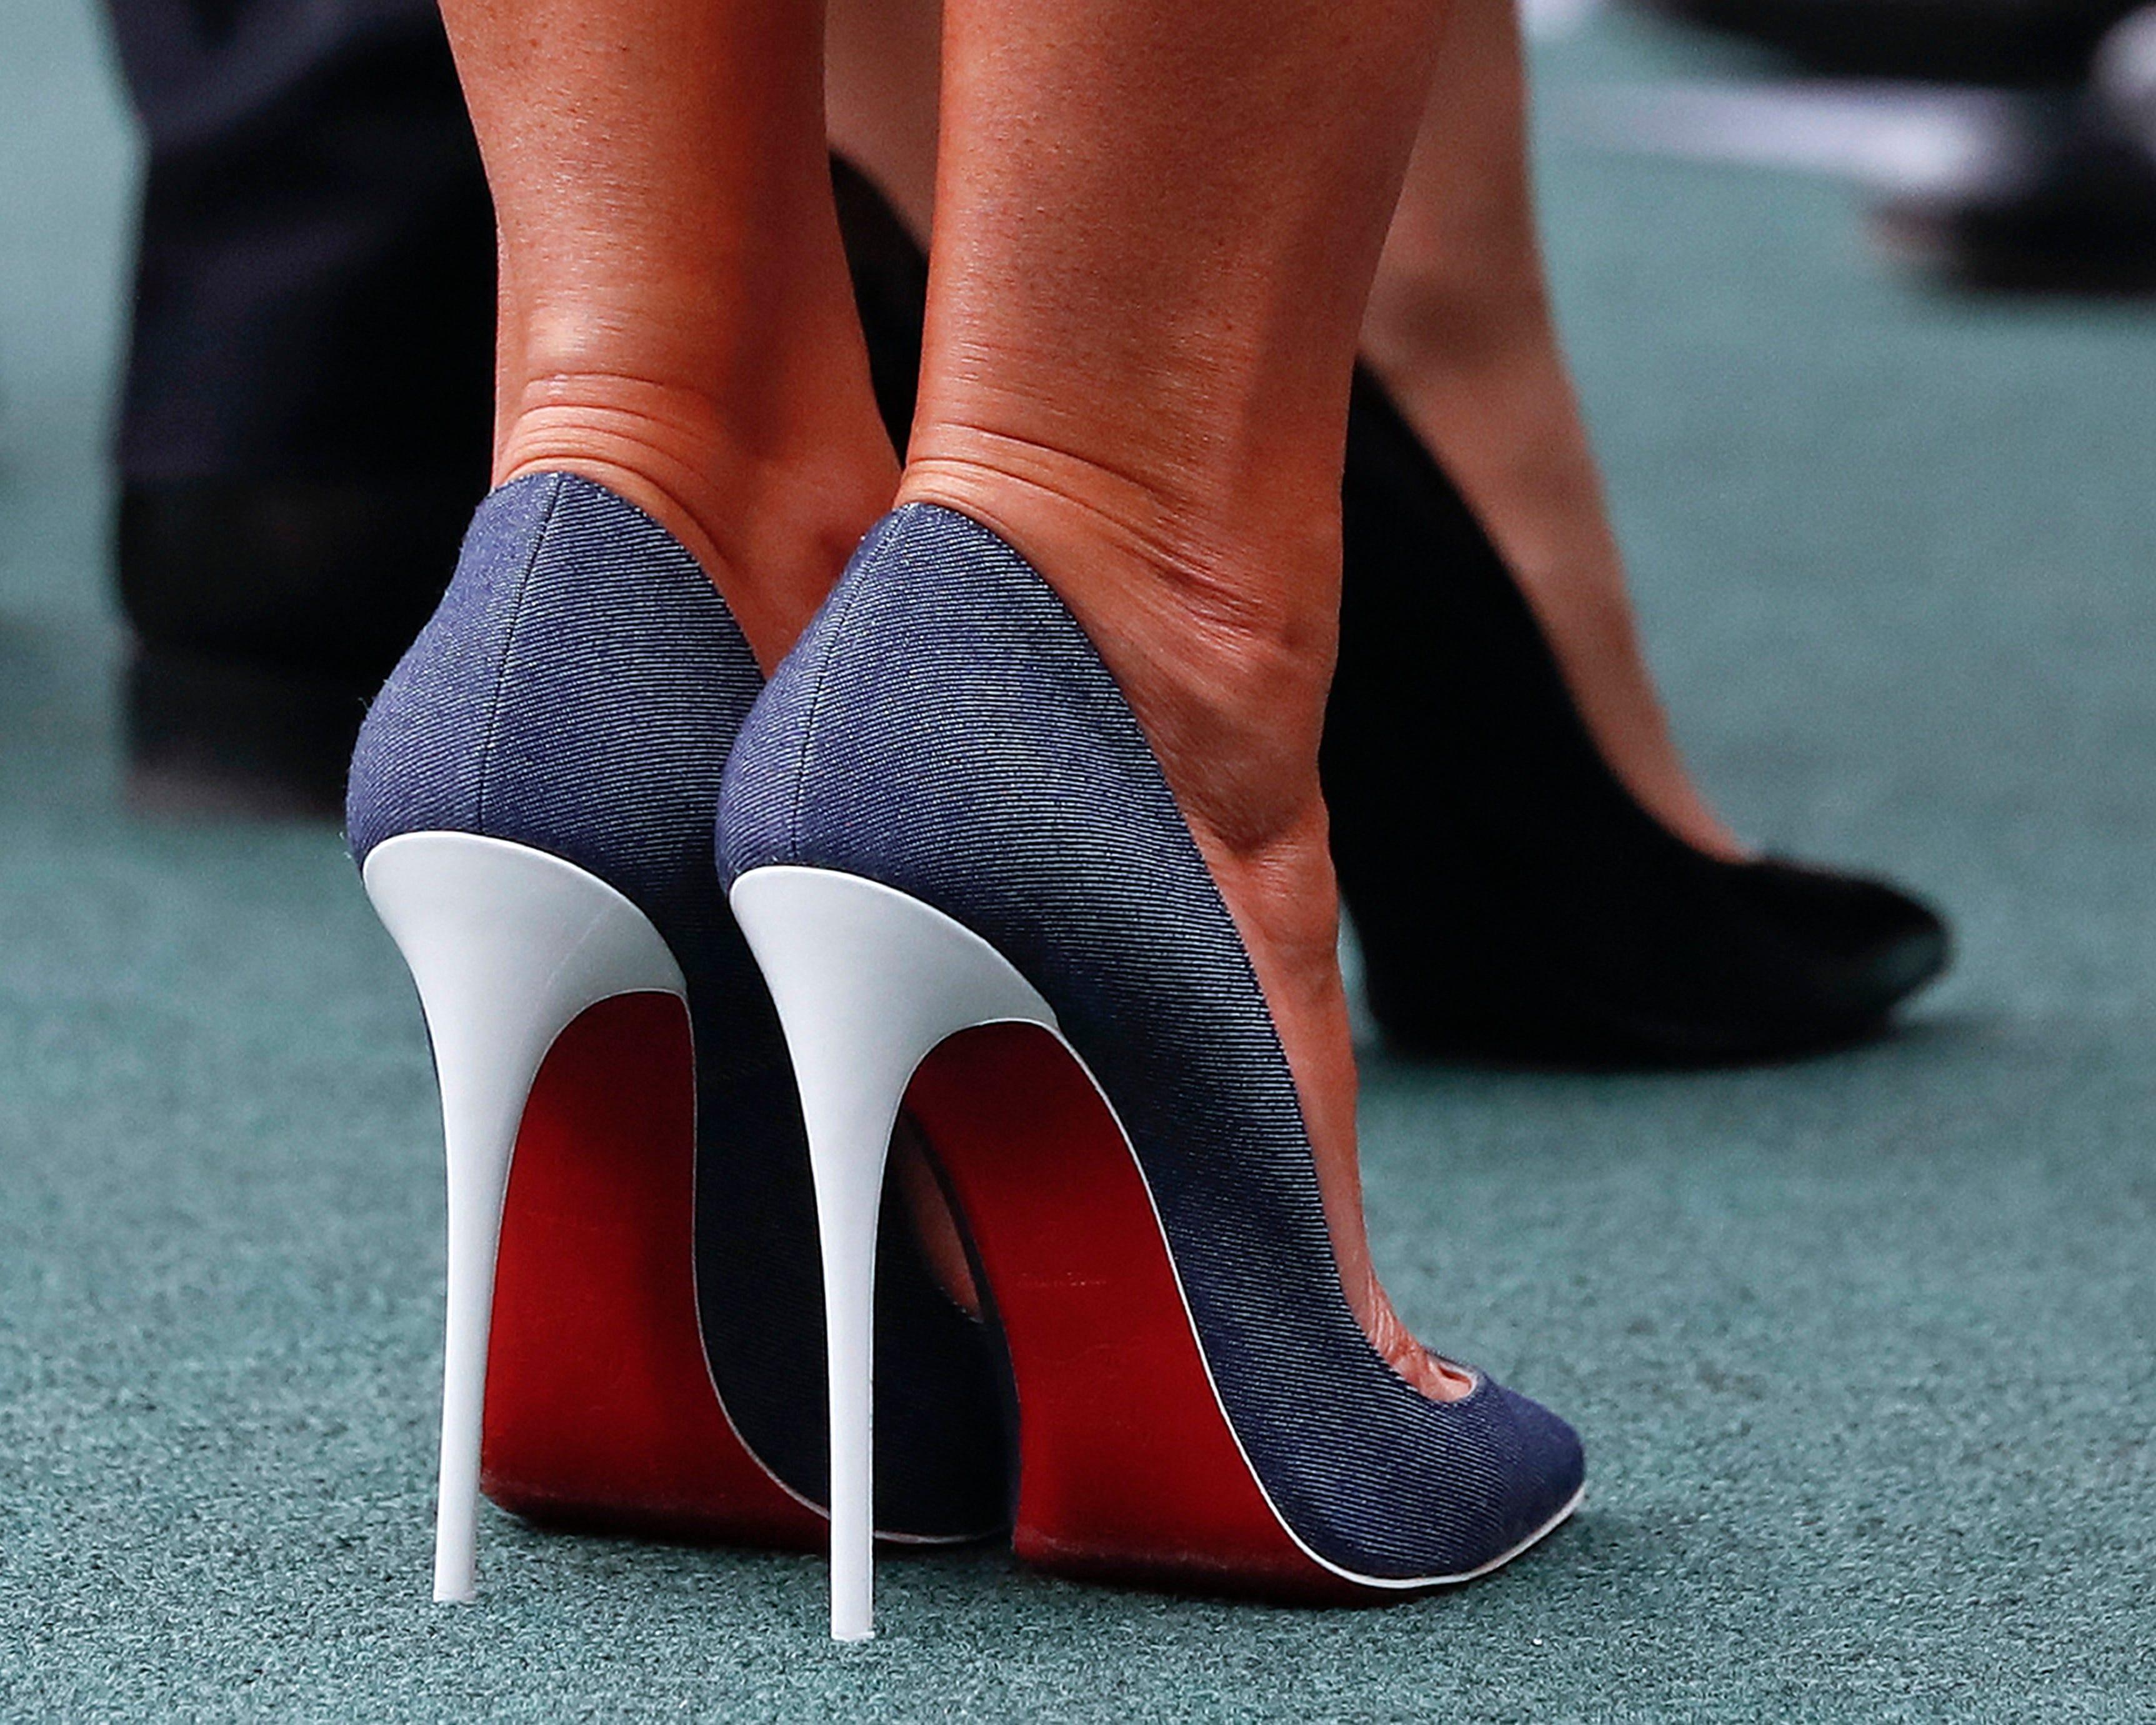 Designer Louboutin wins case on red